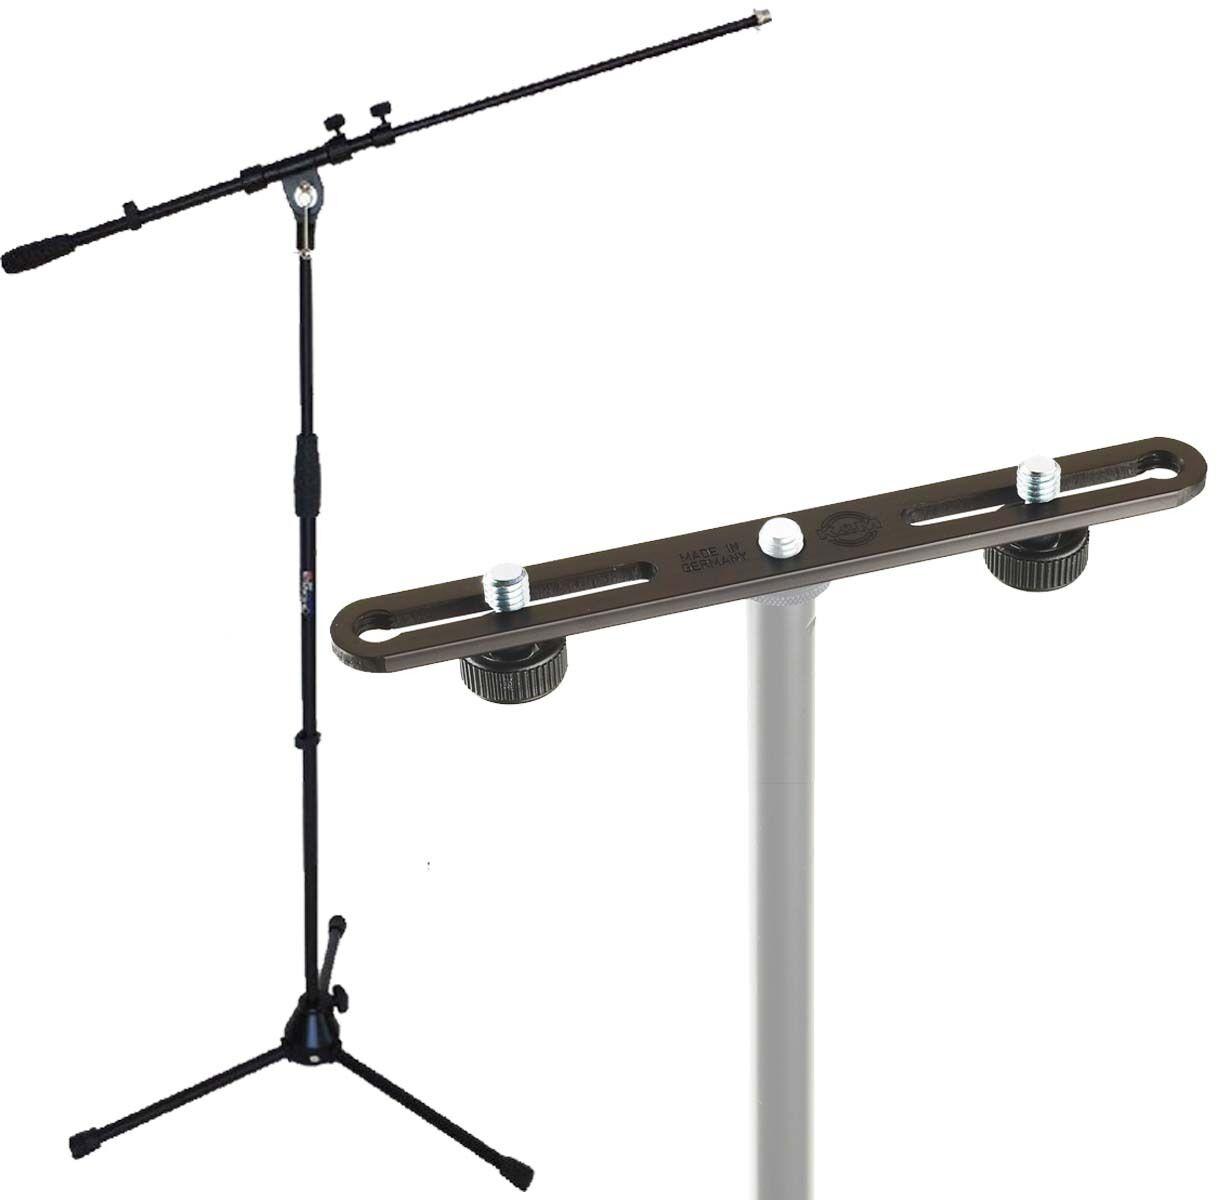 K&m Stereo Bar 23550 + keep Drum Microphone Stand MS107B